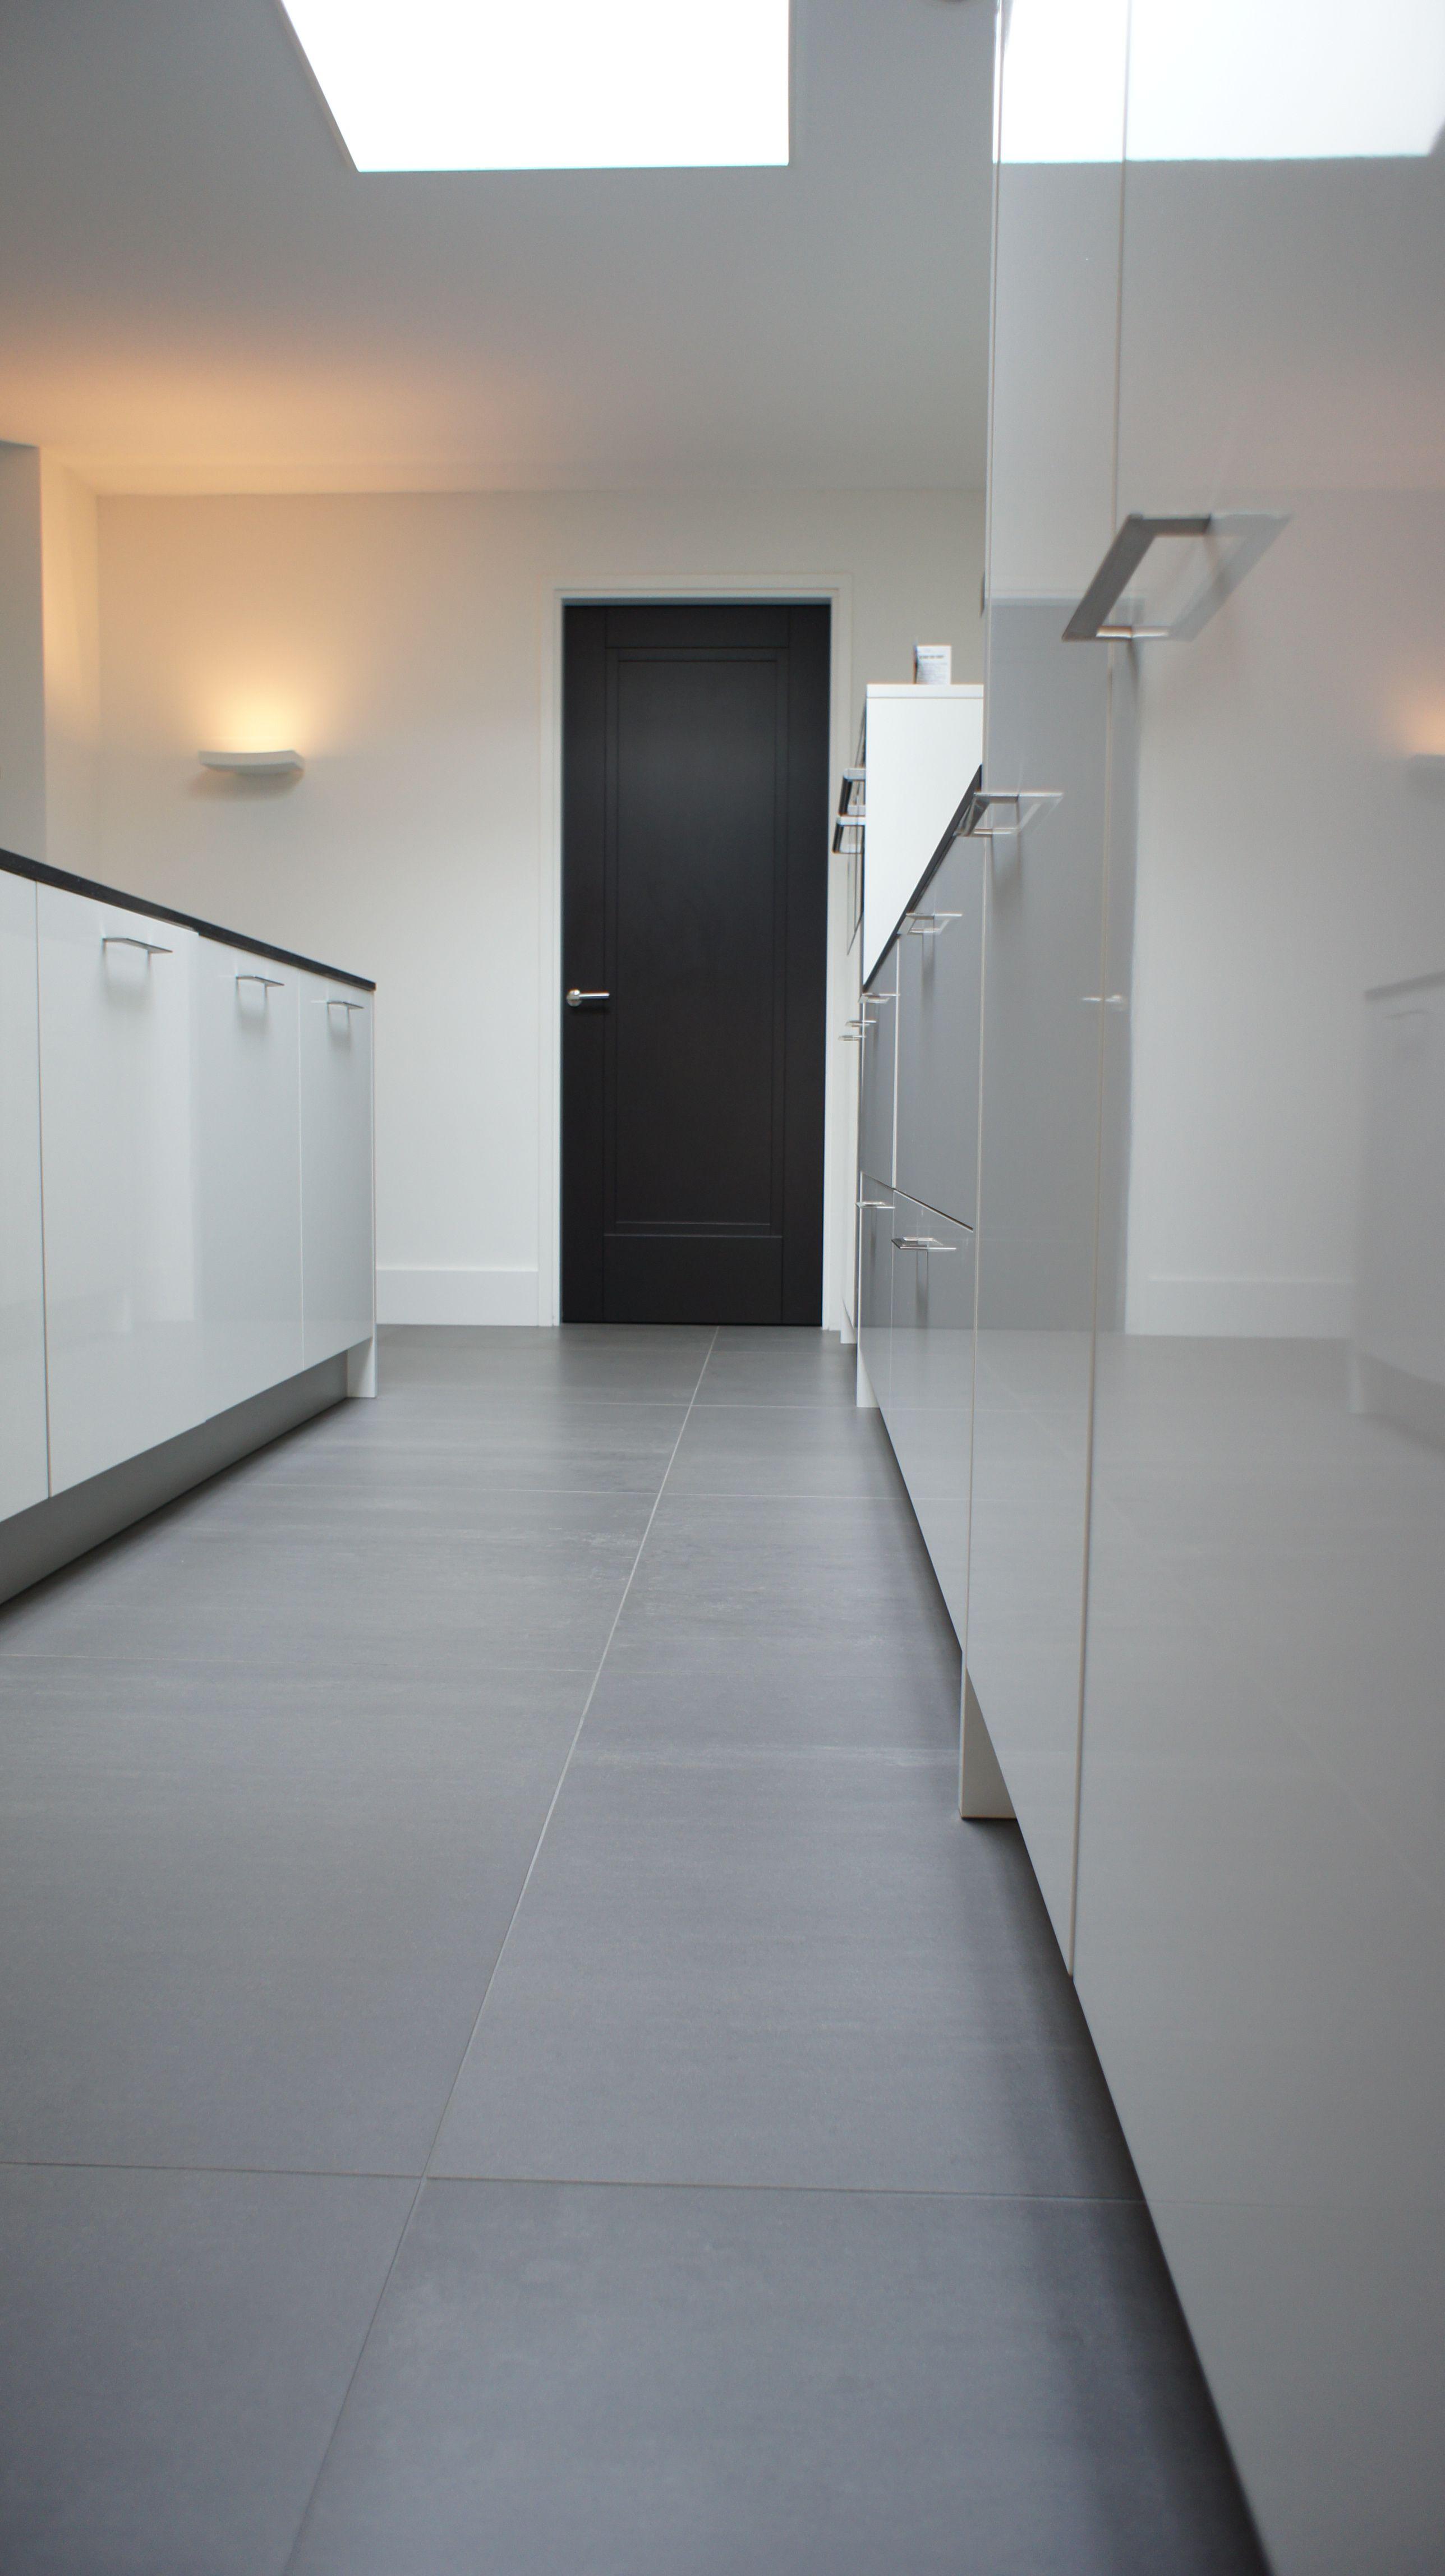 1000 images about floorsâ on pinterest floors white wooden